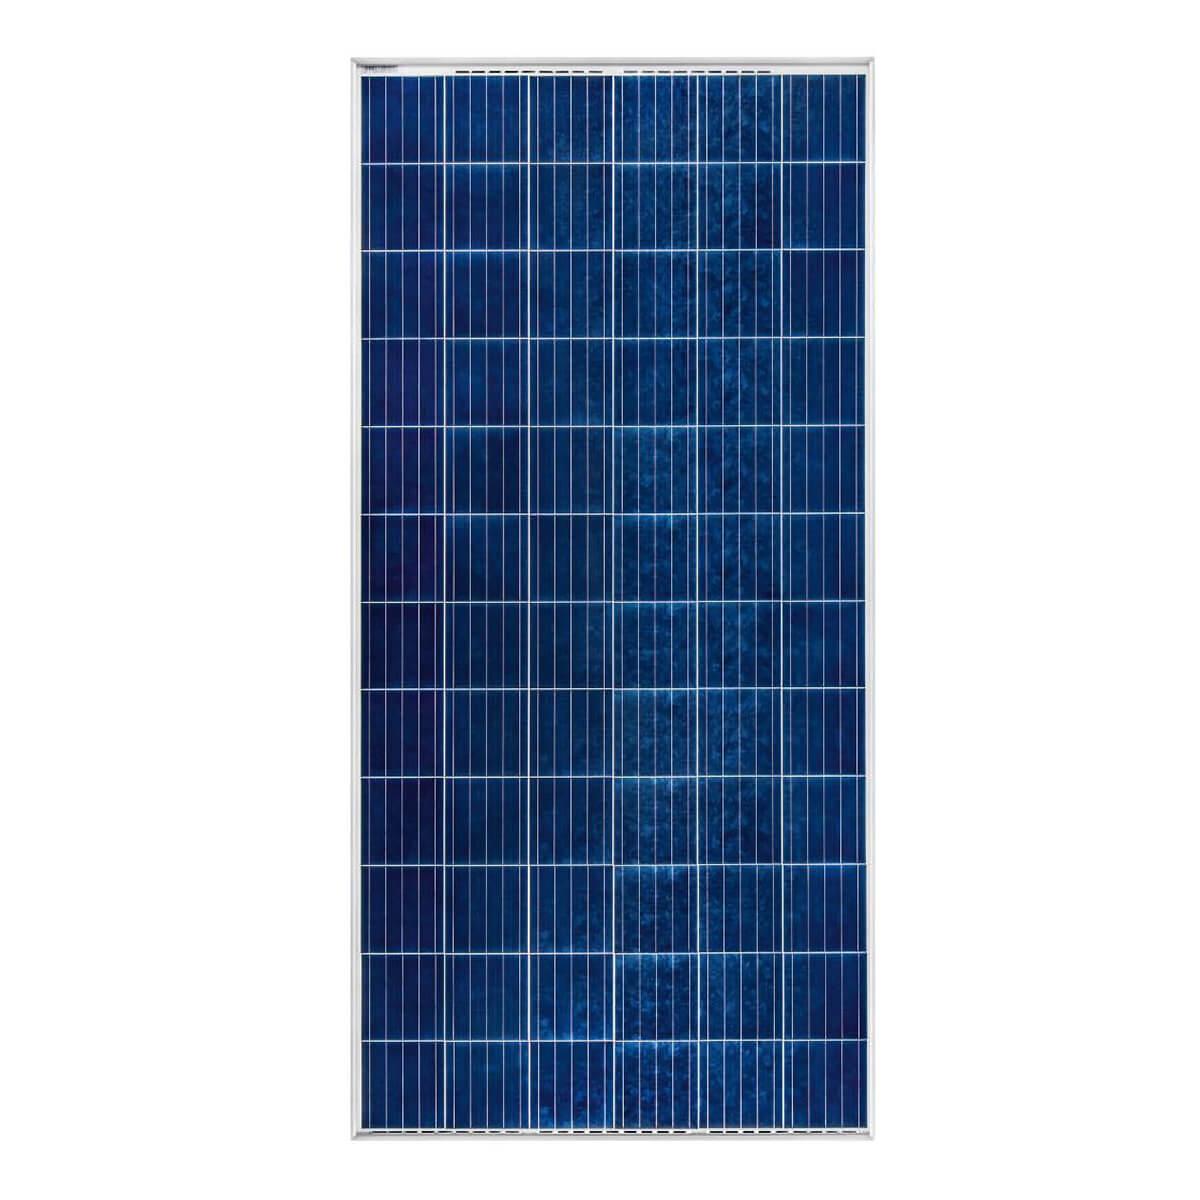 Odul solar 325W panel, odul solar 325Watt panel, Odul solar 325 W panel, odul solar 325 Watt panel, odul solar 325 Watt polikristal panel, Odul solar 325 W watt gunes paneli, odul solar 325 W watt polikristal gunes paneli, odul solar 325 W Watt fotovoltaik polikristal solar panel, odul solar 325W polikristal gunes enerjisi, odul solar OSP72-325W panel